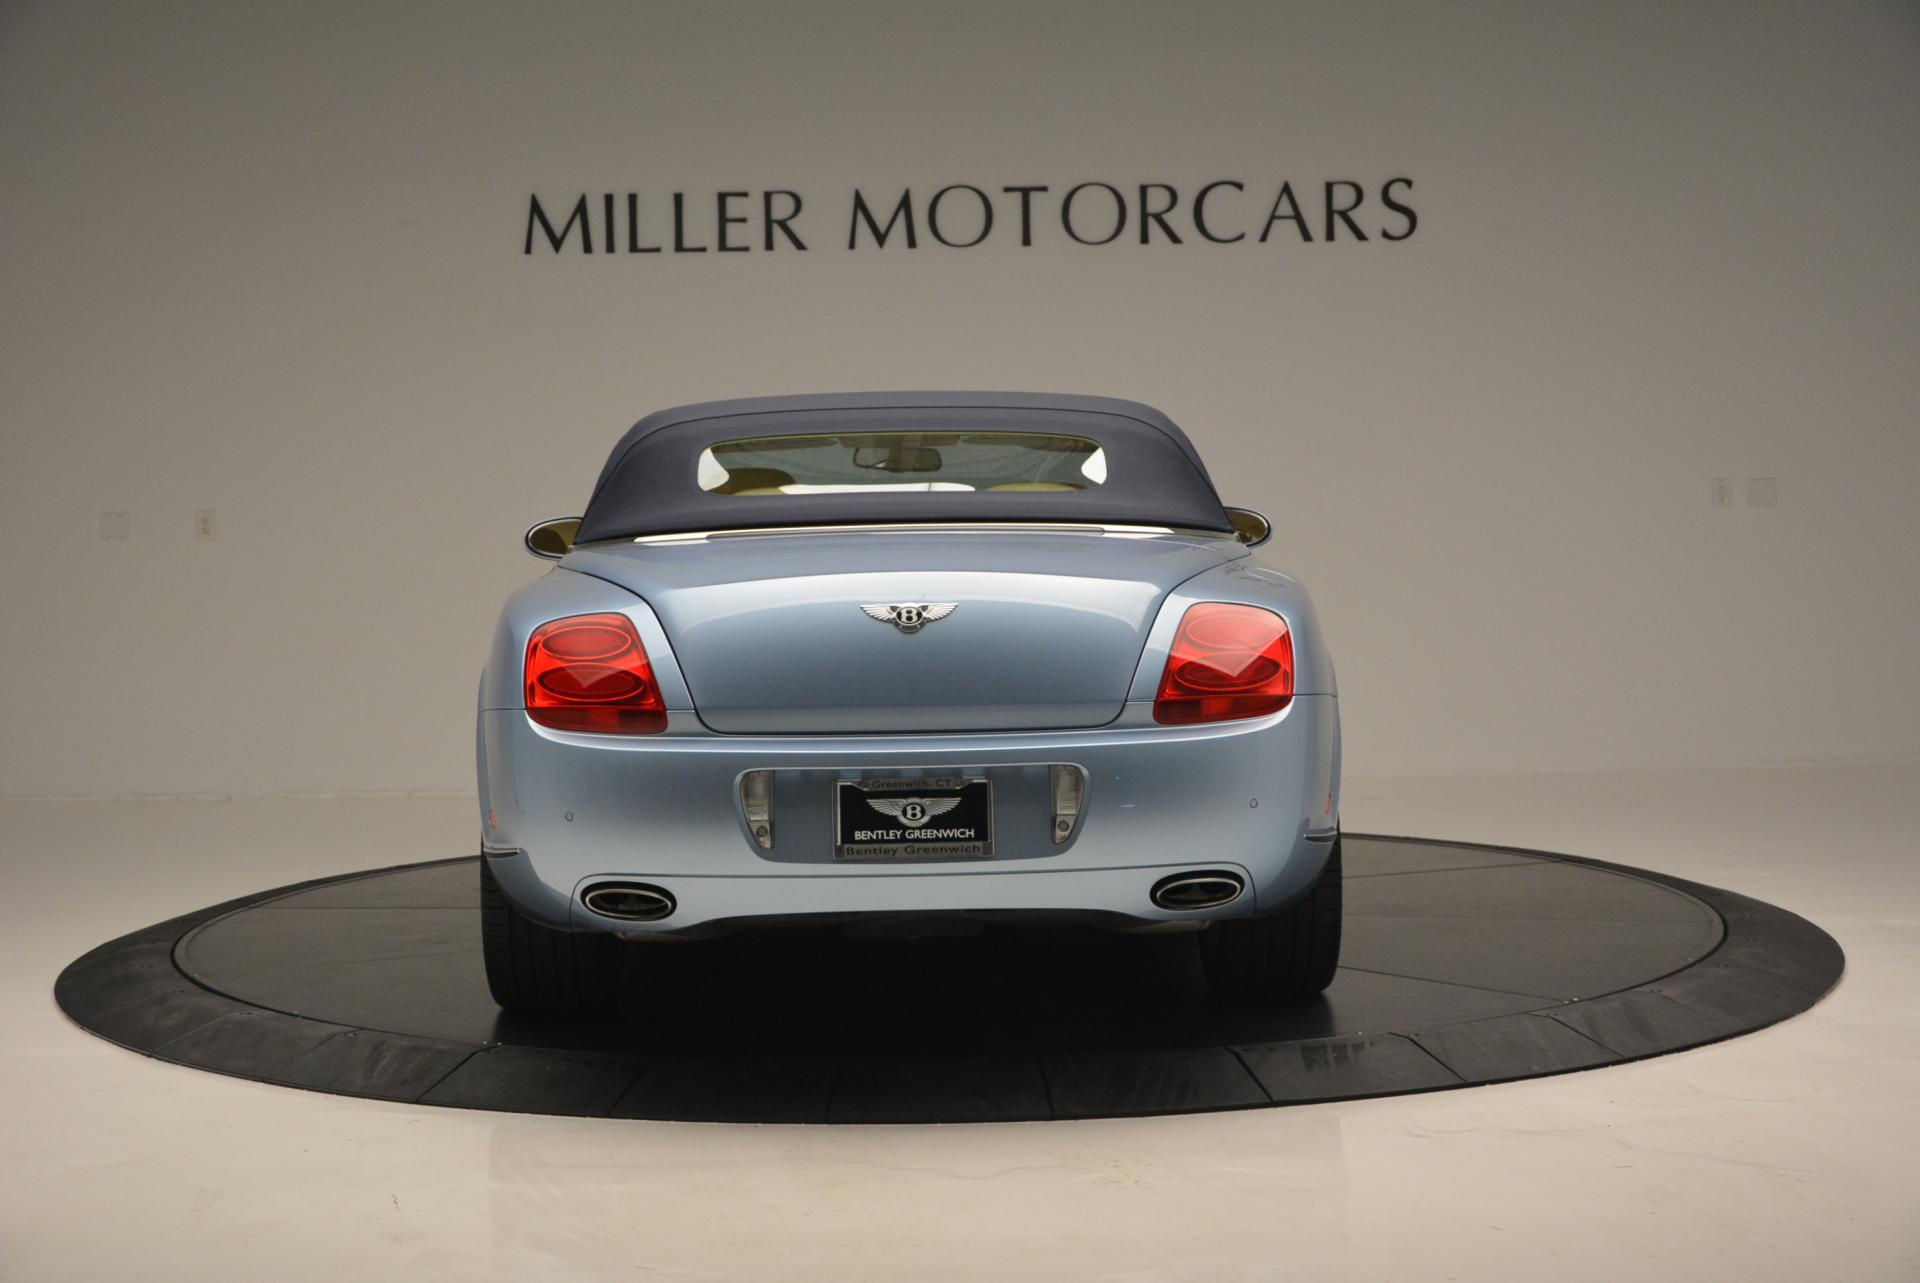 Used 2007 Bentley Continental GTC  For Sale In Westport, CT 495_p18